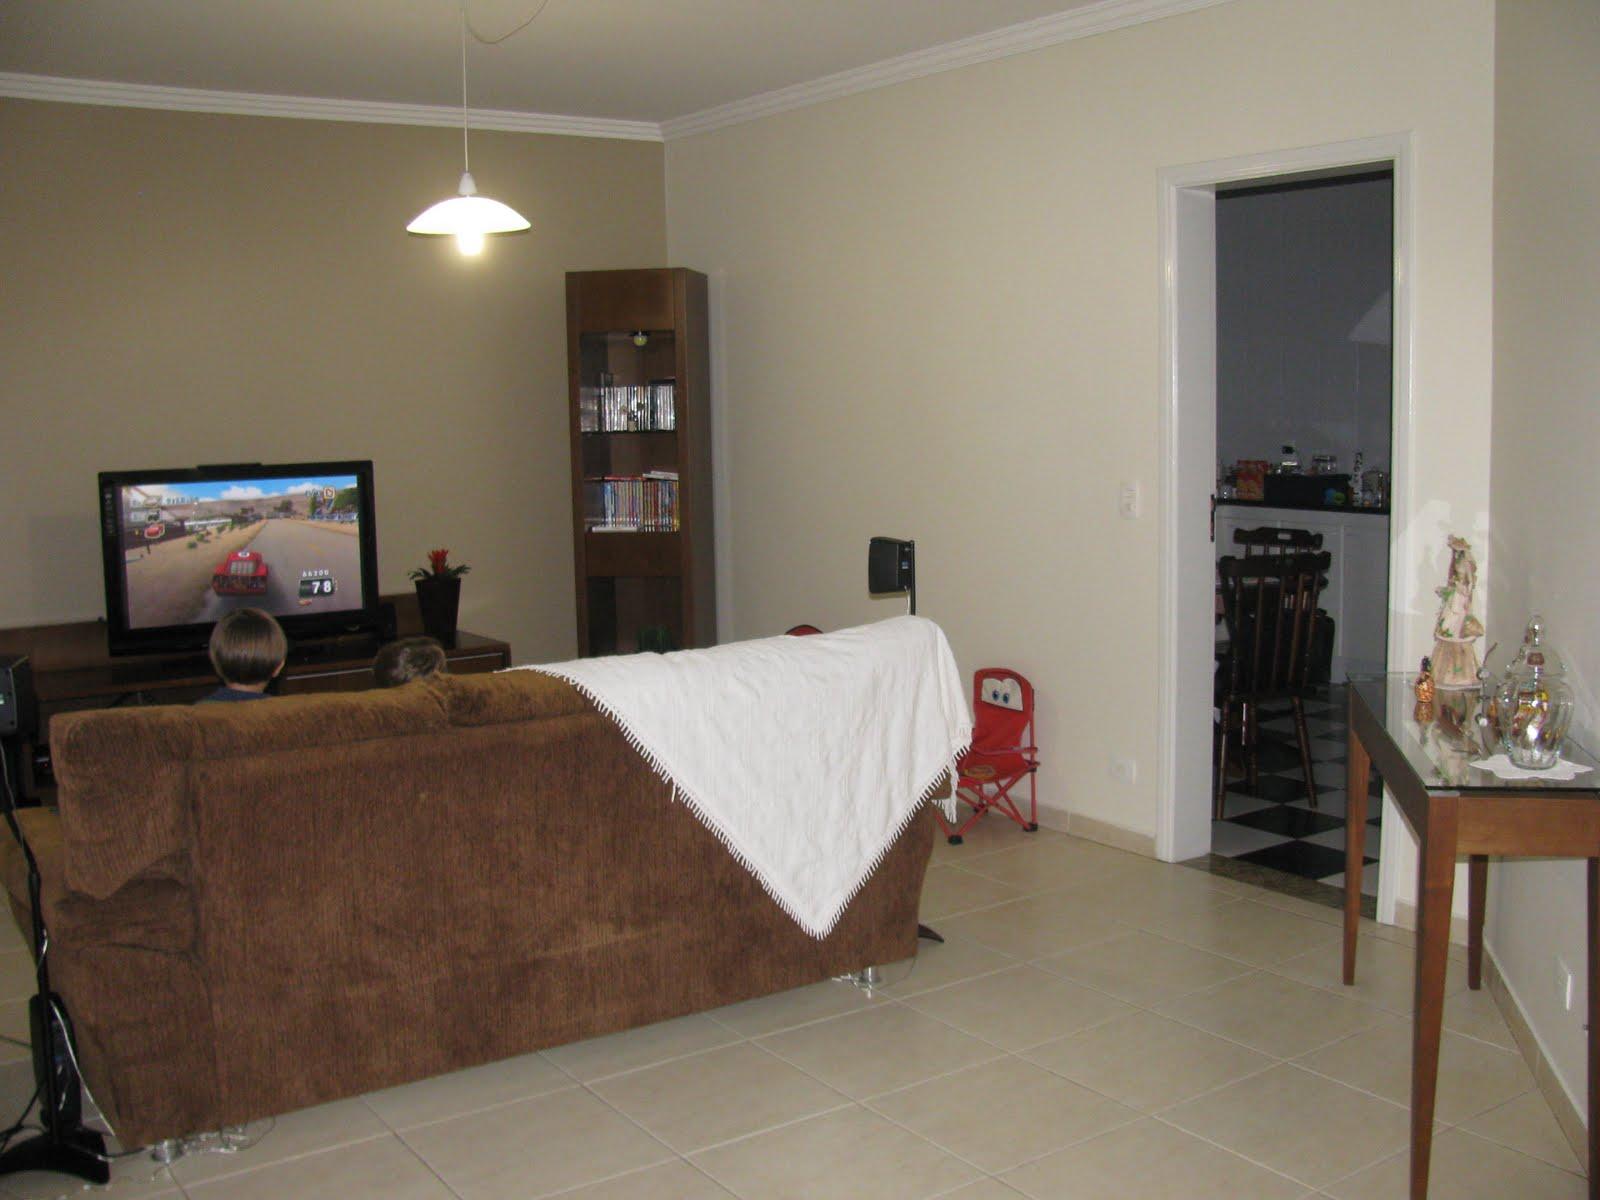 Esta é minha sala de tv com pintura nova ainda falta pendurar a tv  #216BAA 1600x1200